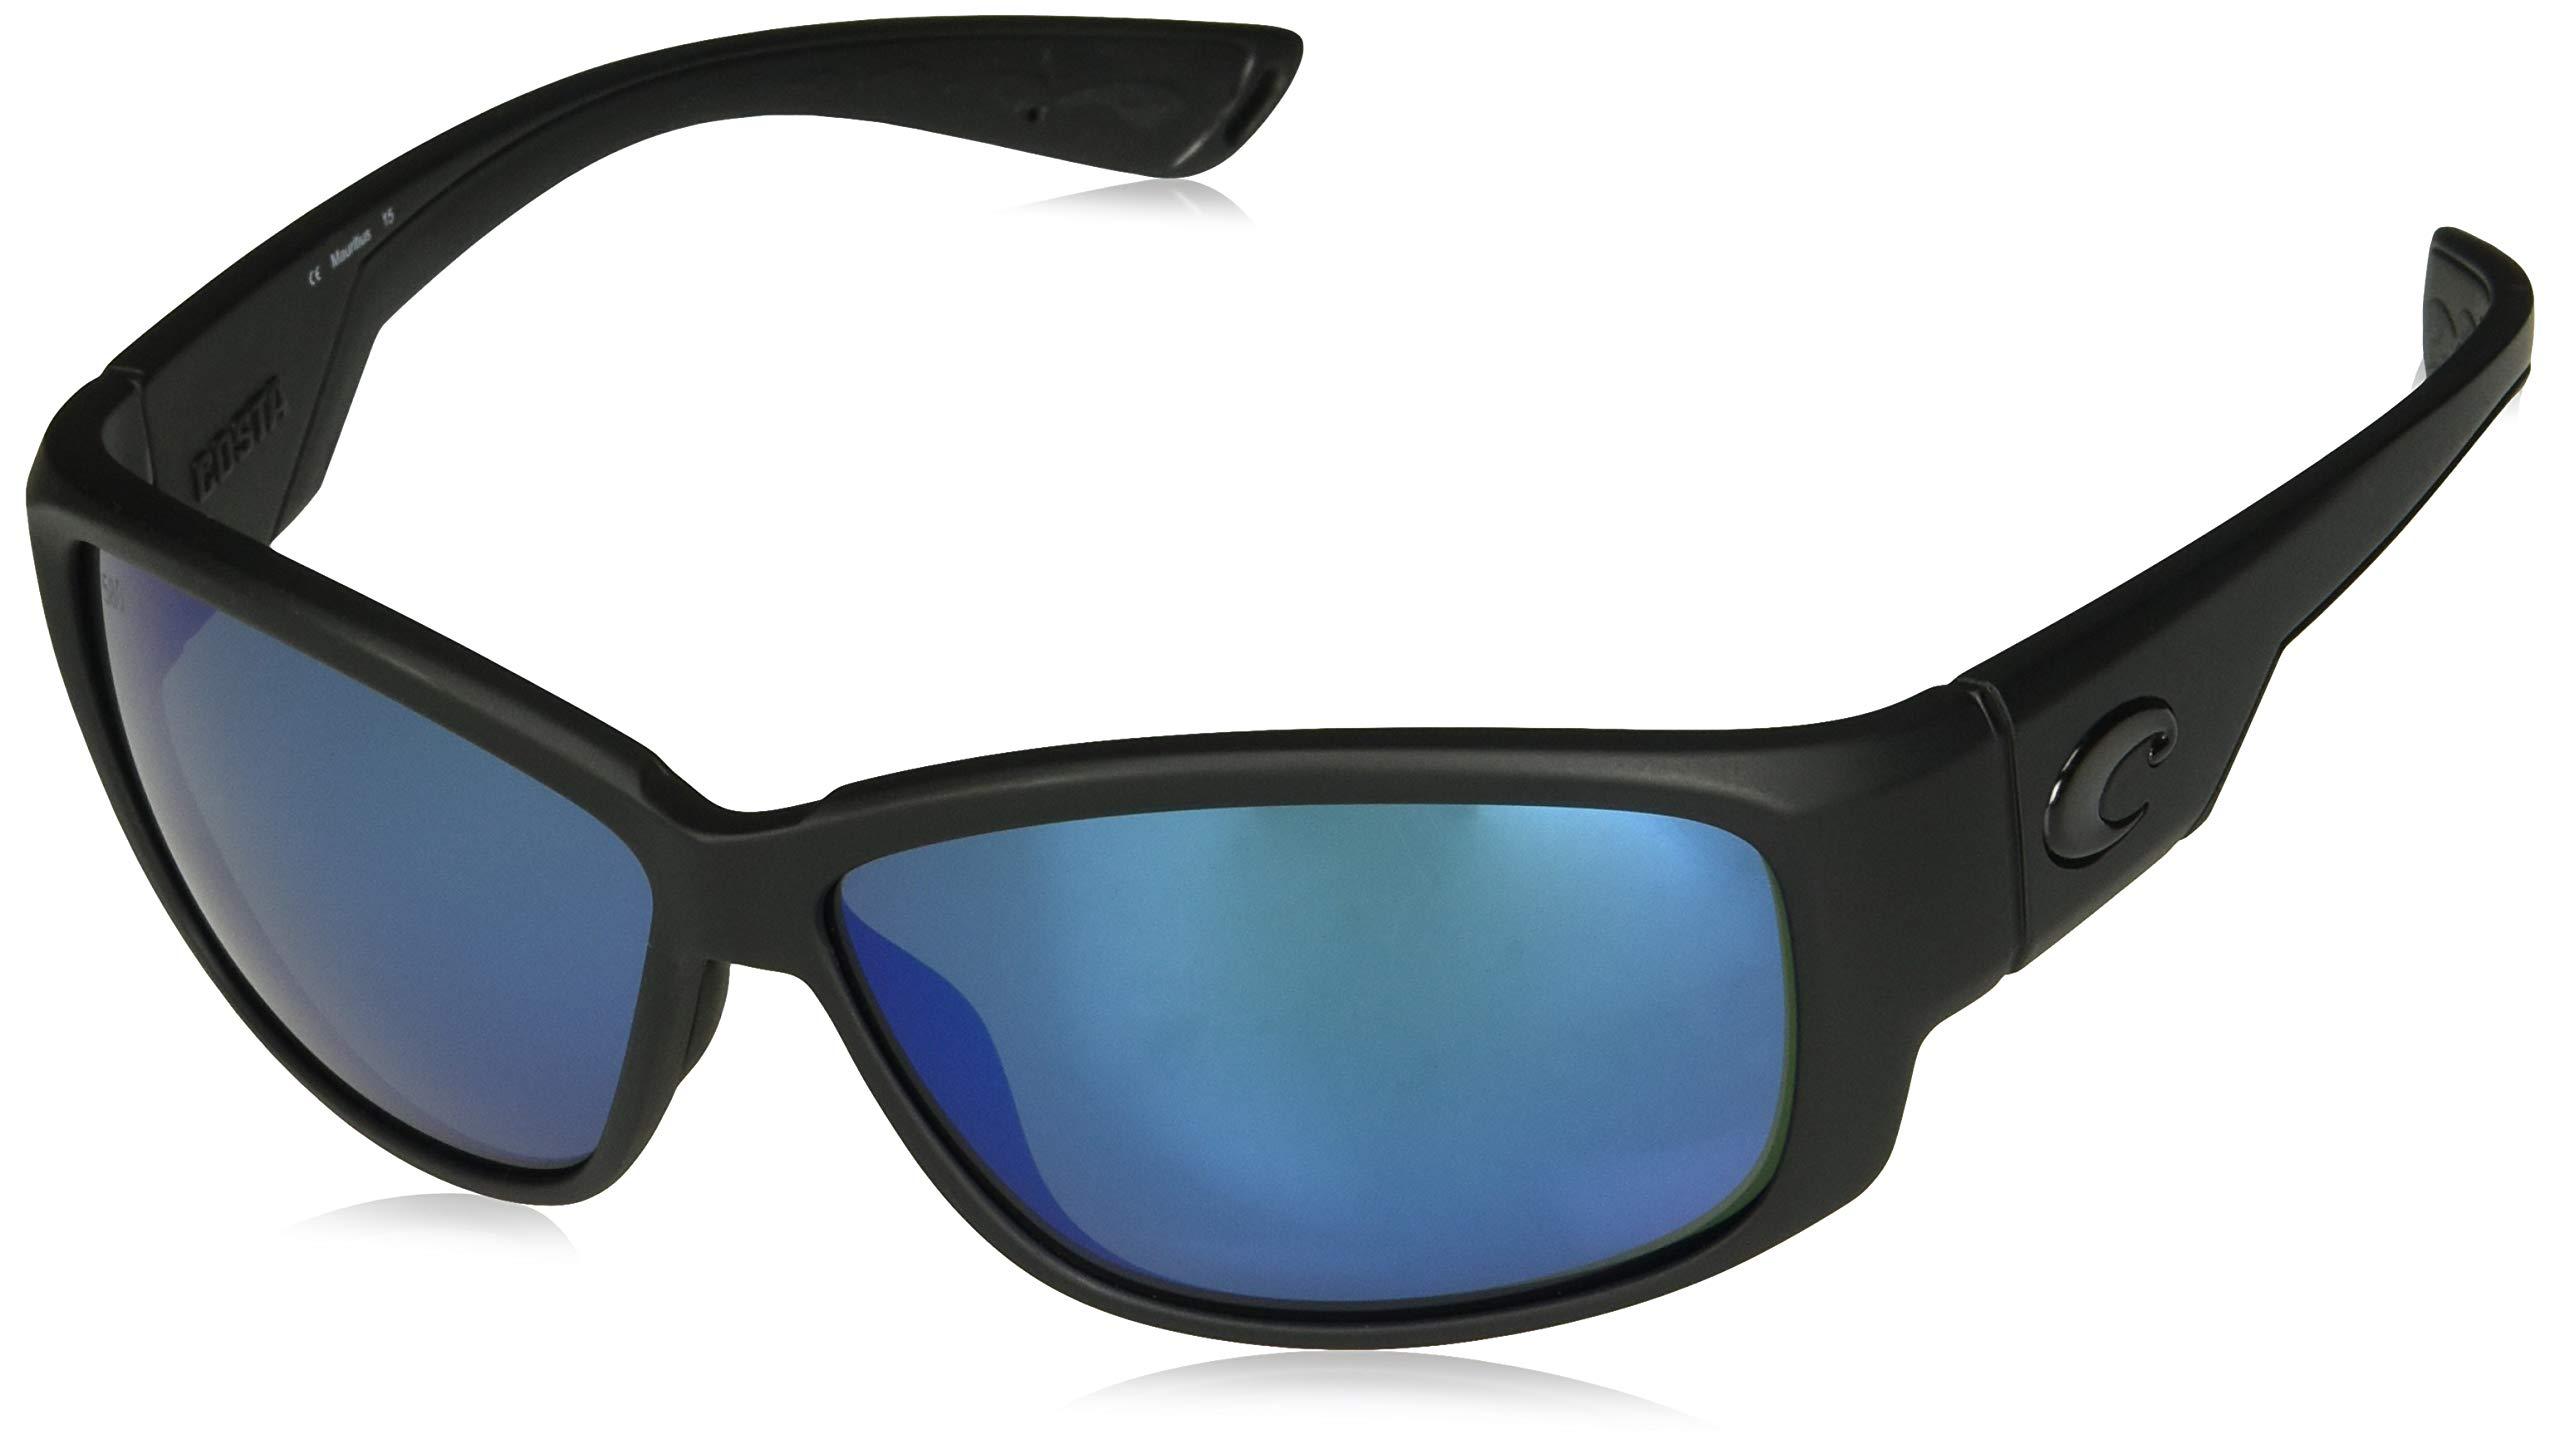 Costa Del Mar Luke Sunglasses, Blackout, Blue Mirror 580G Lens by Costa Del Mar